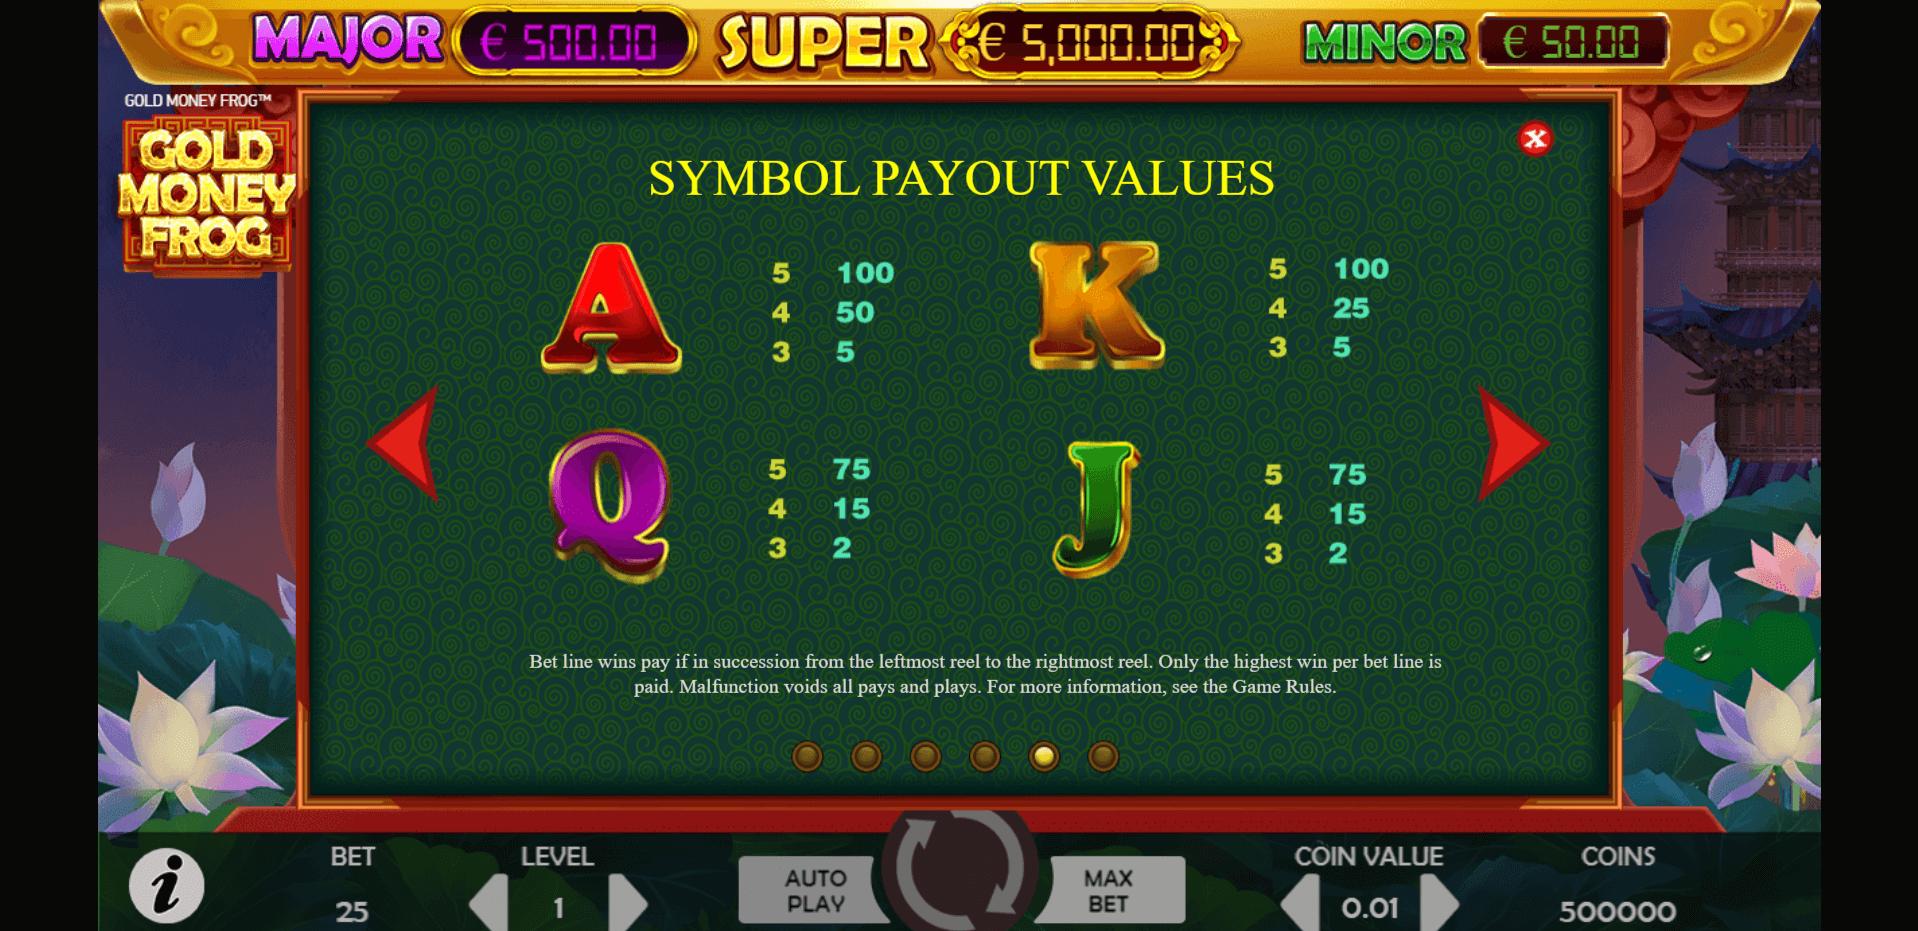 Gold Money Frog Slot Machine